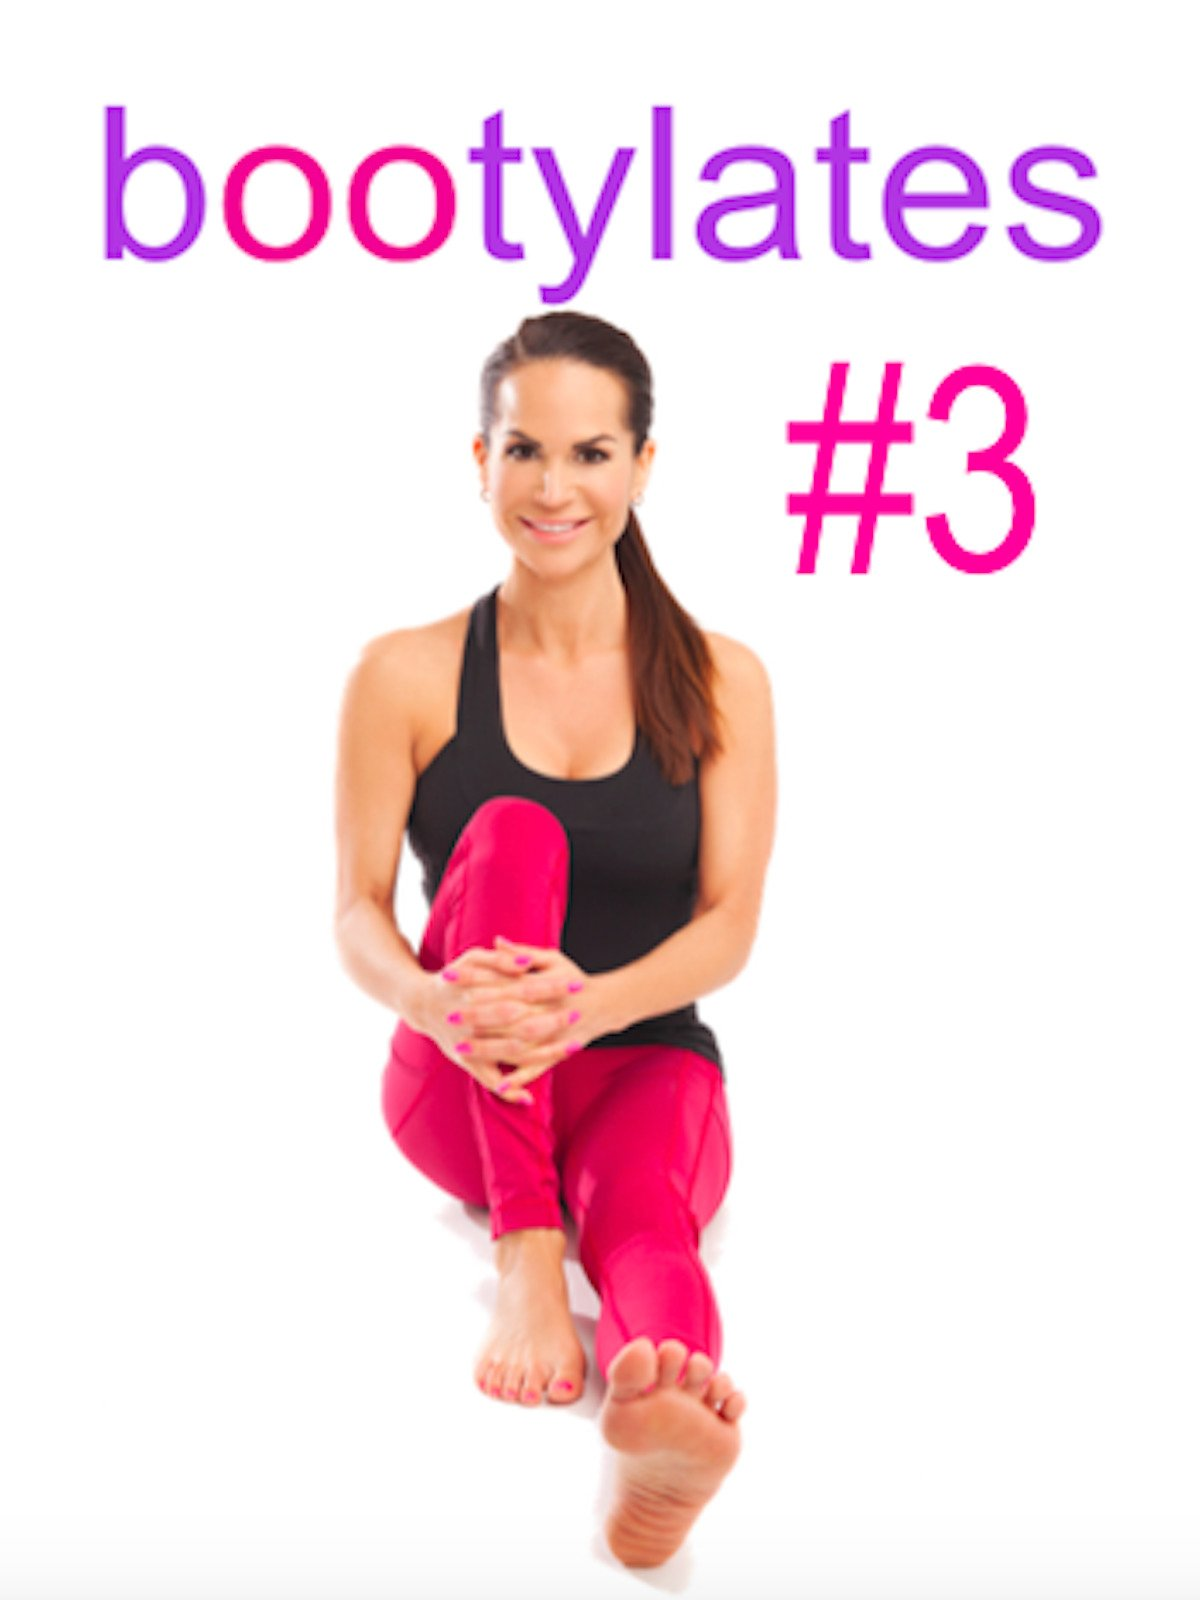 Bootylates #3